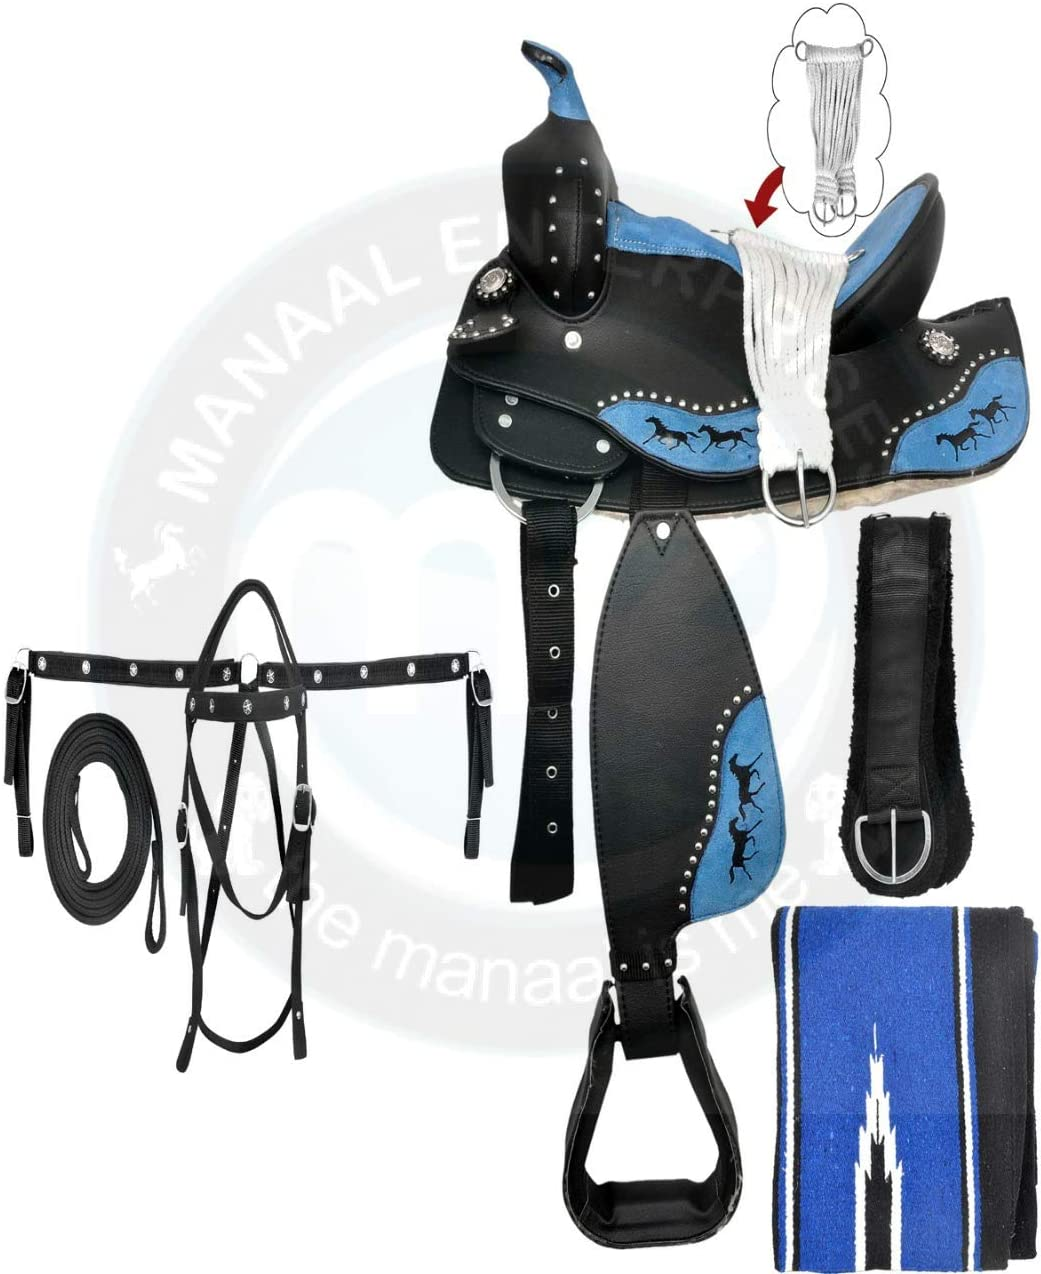 Manaal Popular Branded goods popular Enterprises Synthetic Western Adult Saddle Tack Ba Horse